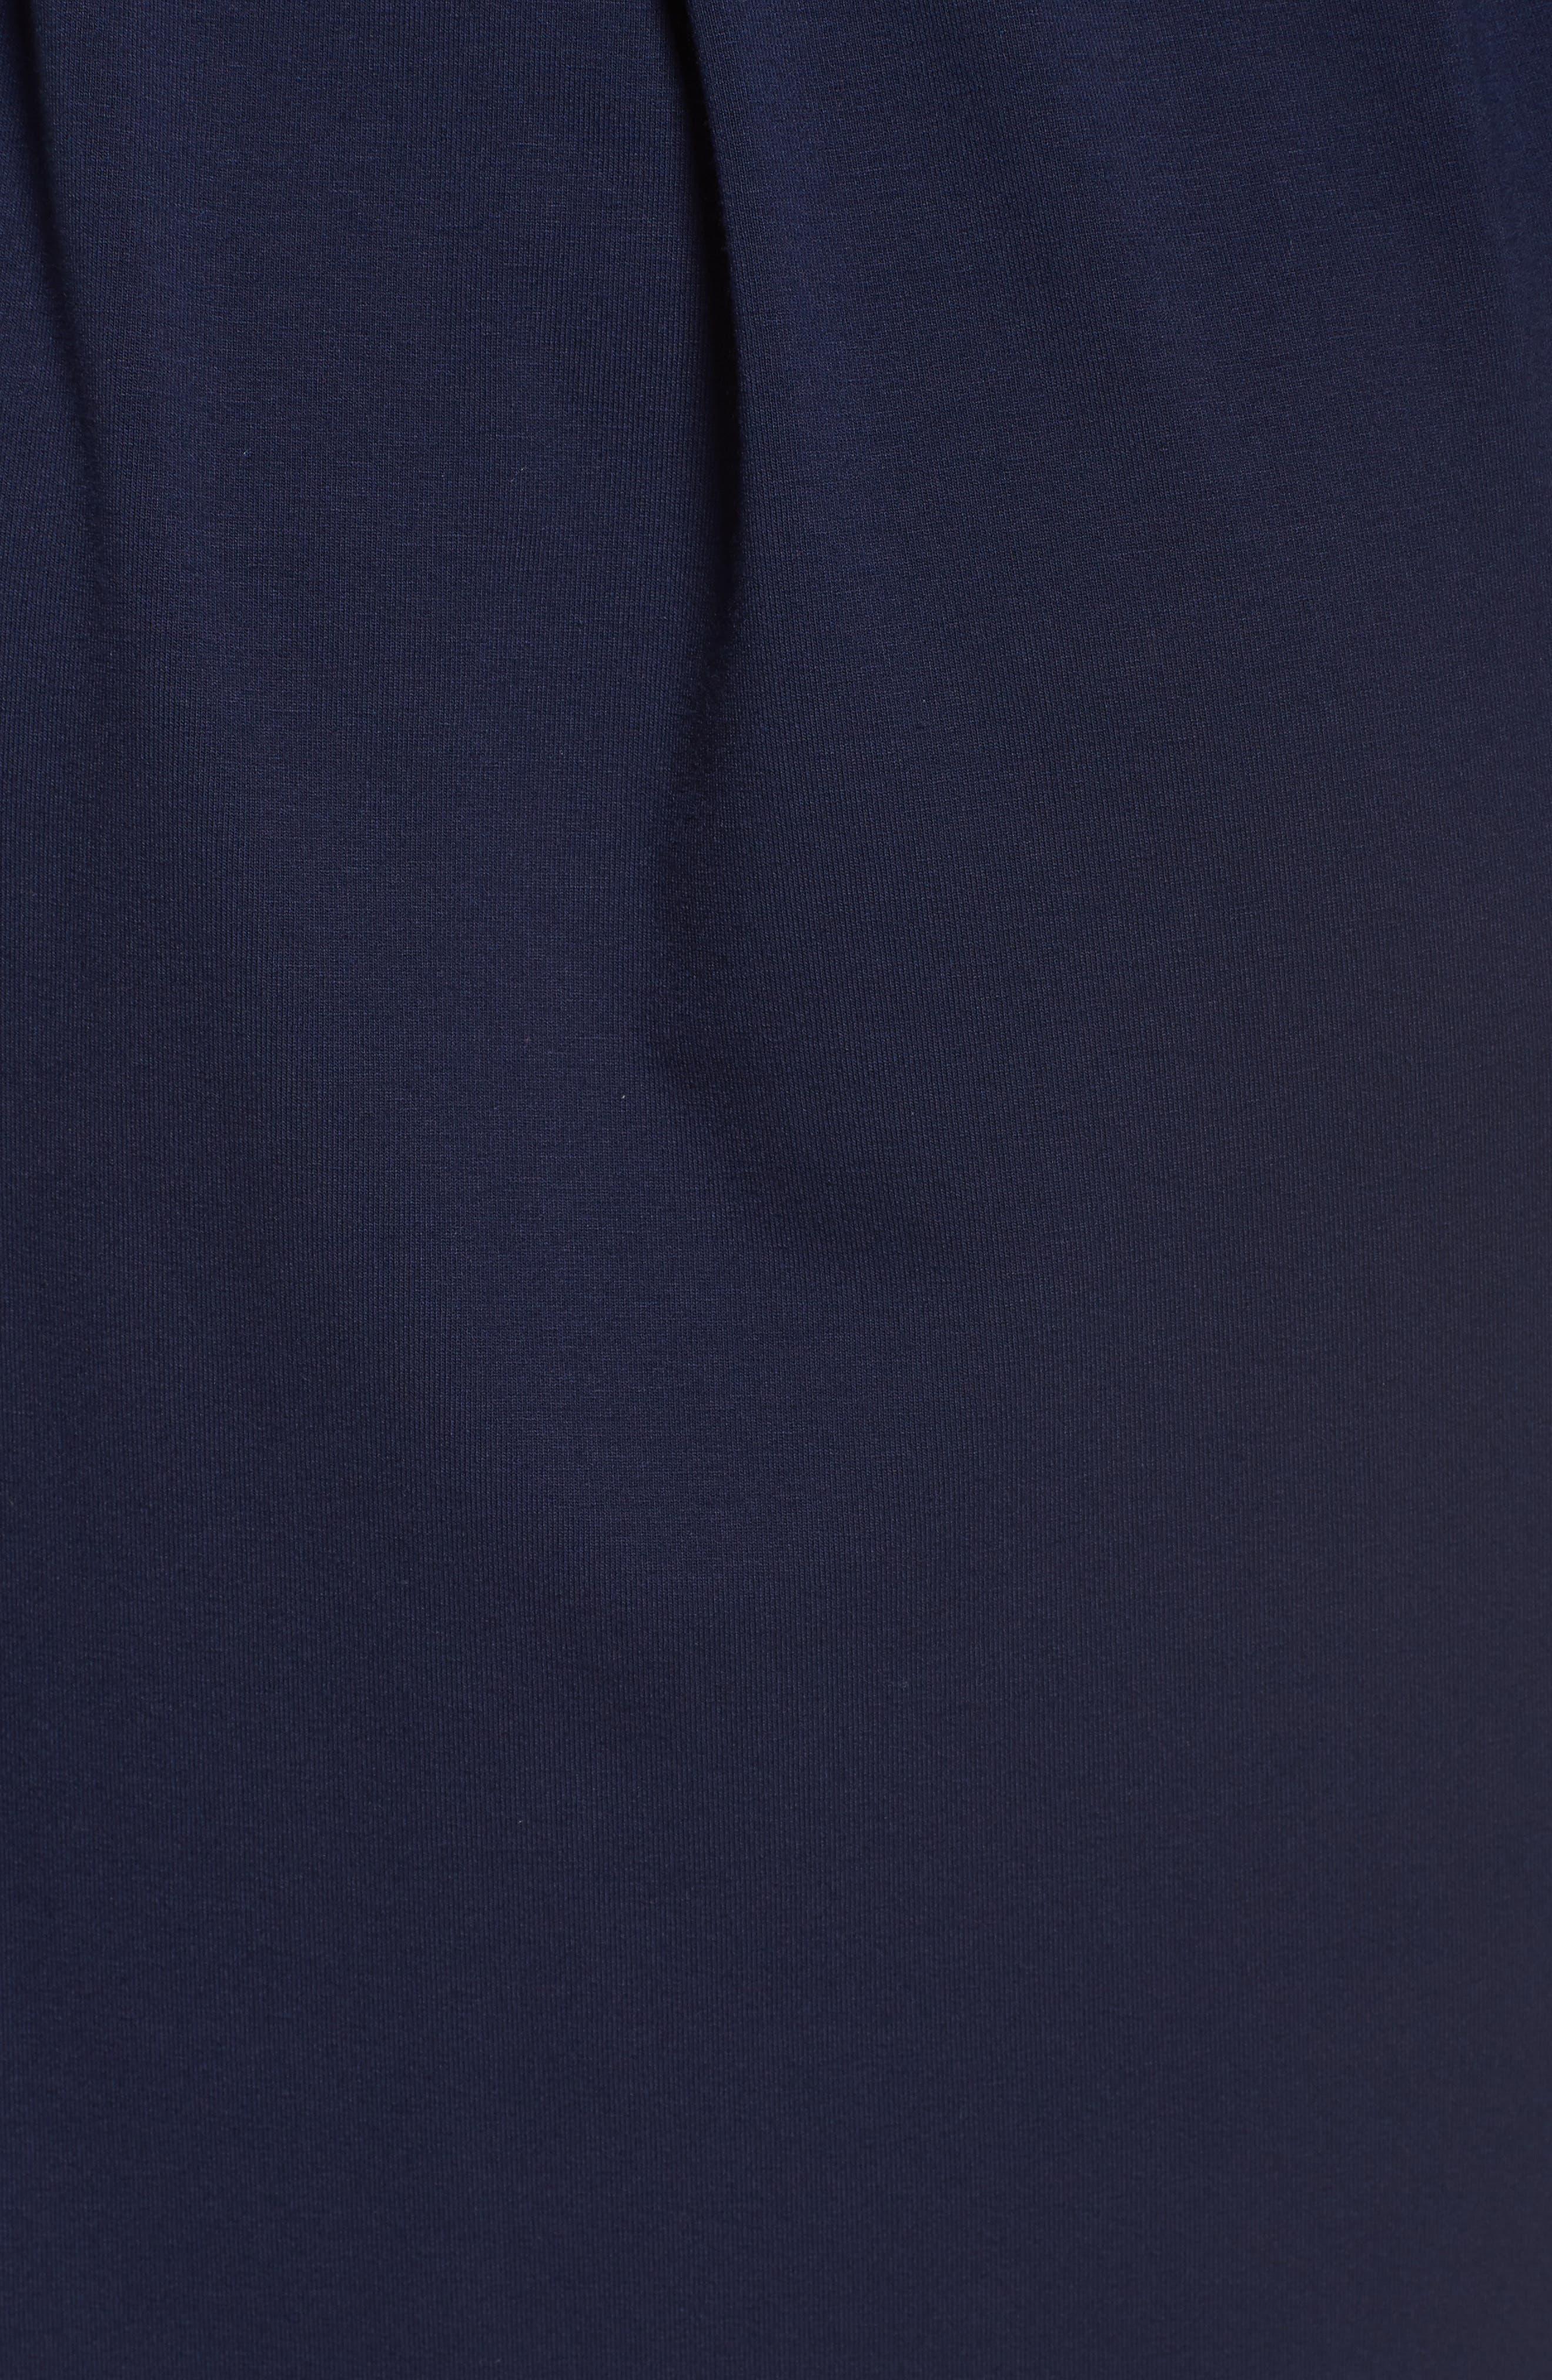 Bailor Shirtdress,                             Alternate thumbnail 5, color,